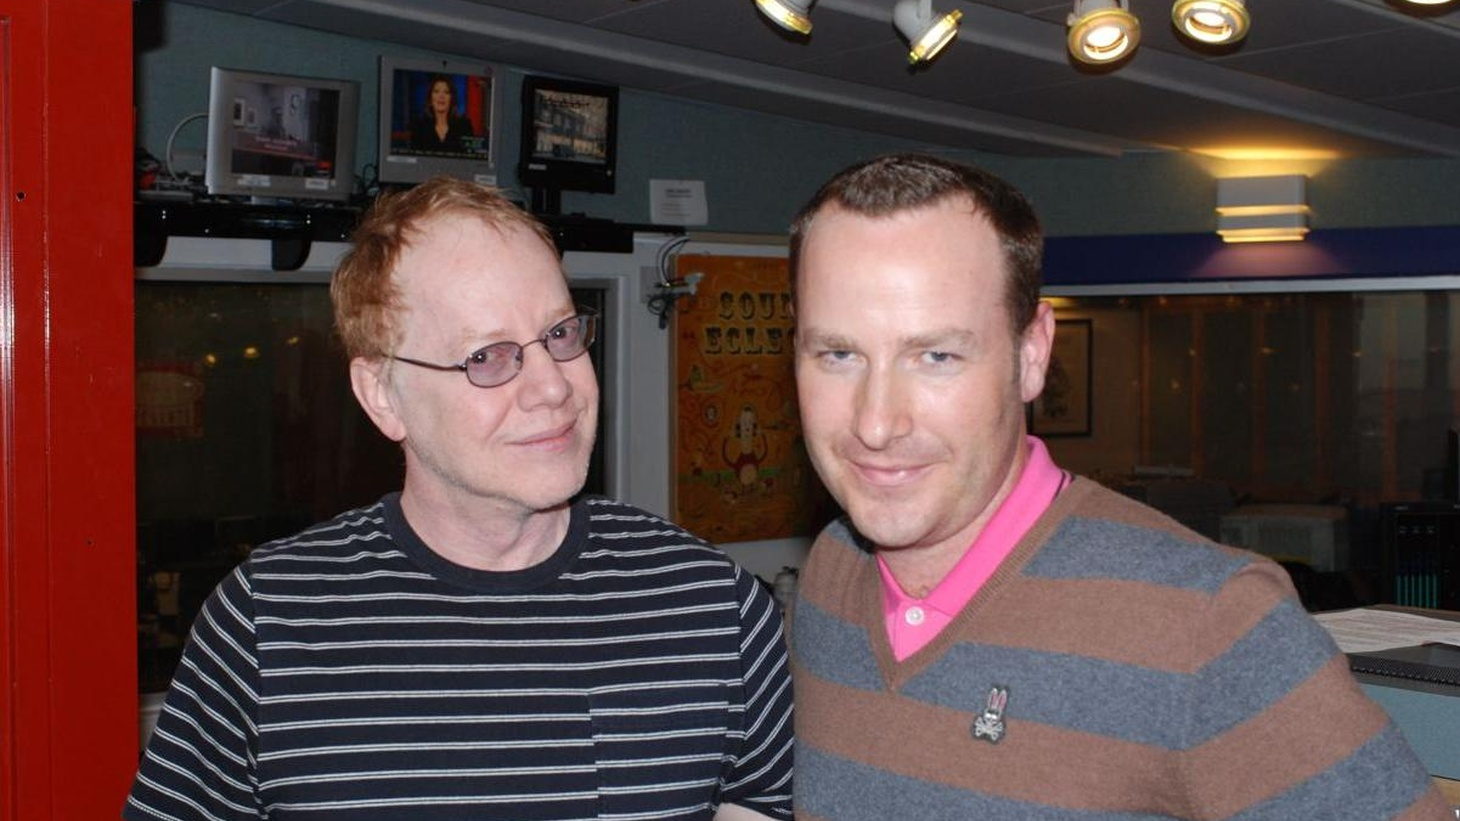 Film composer Danny Elfman scored the new Cirque du Soleil show, Iris, at the Kodak Theater.